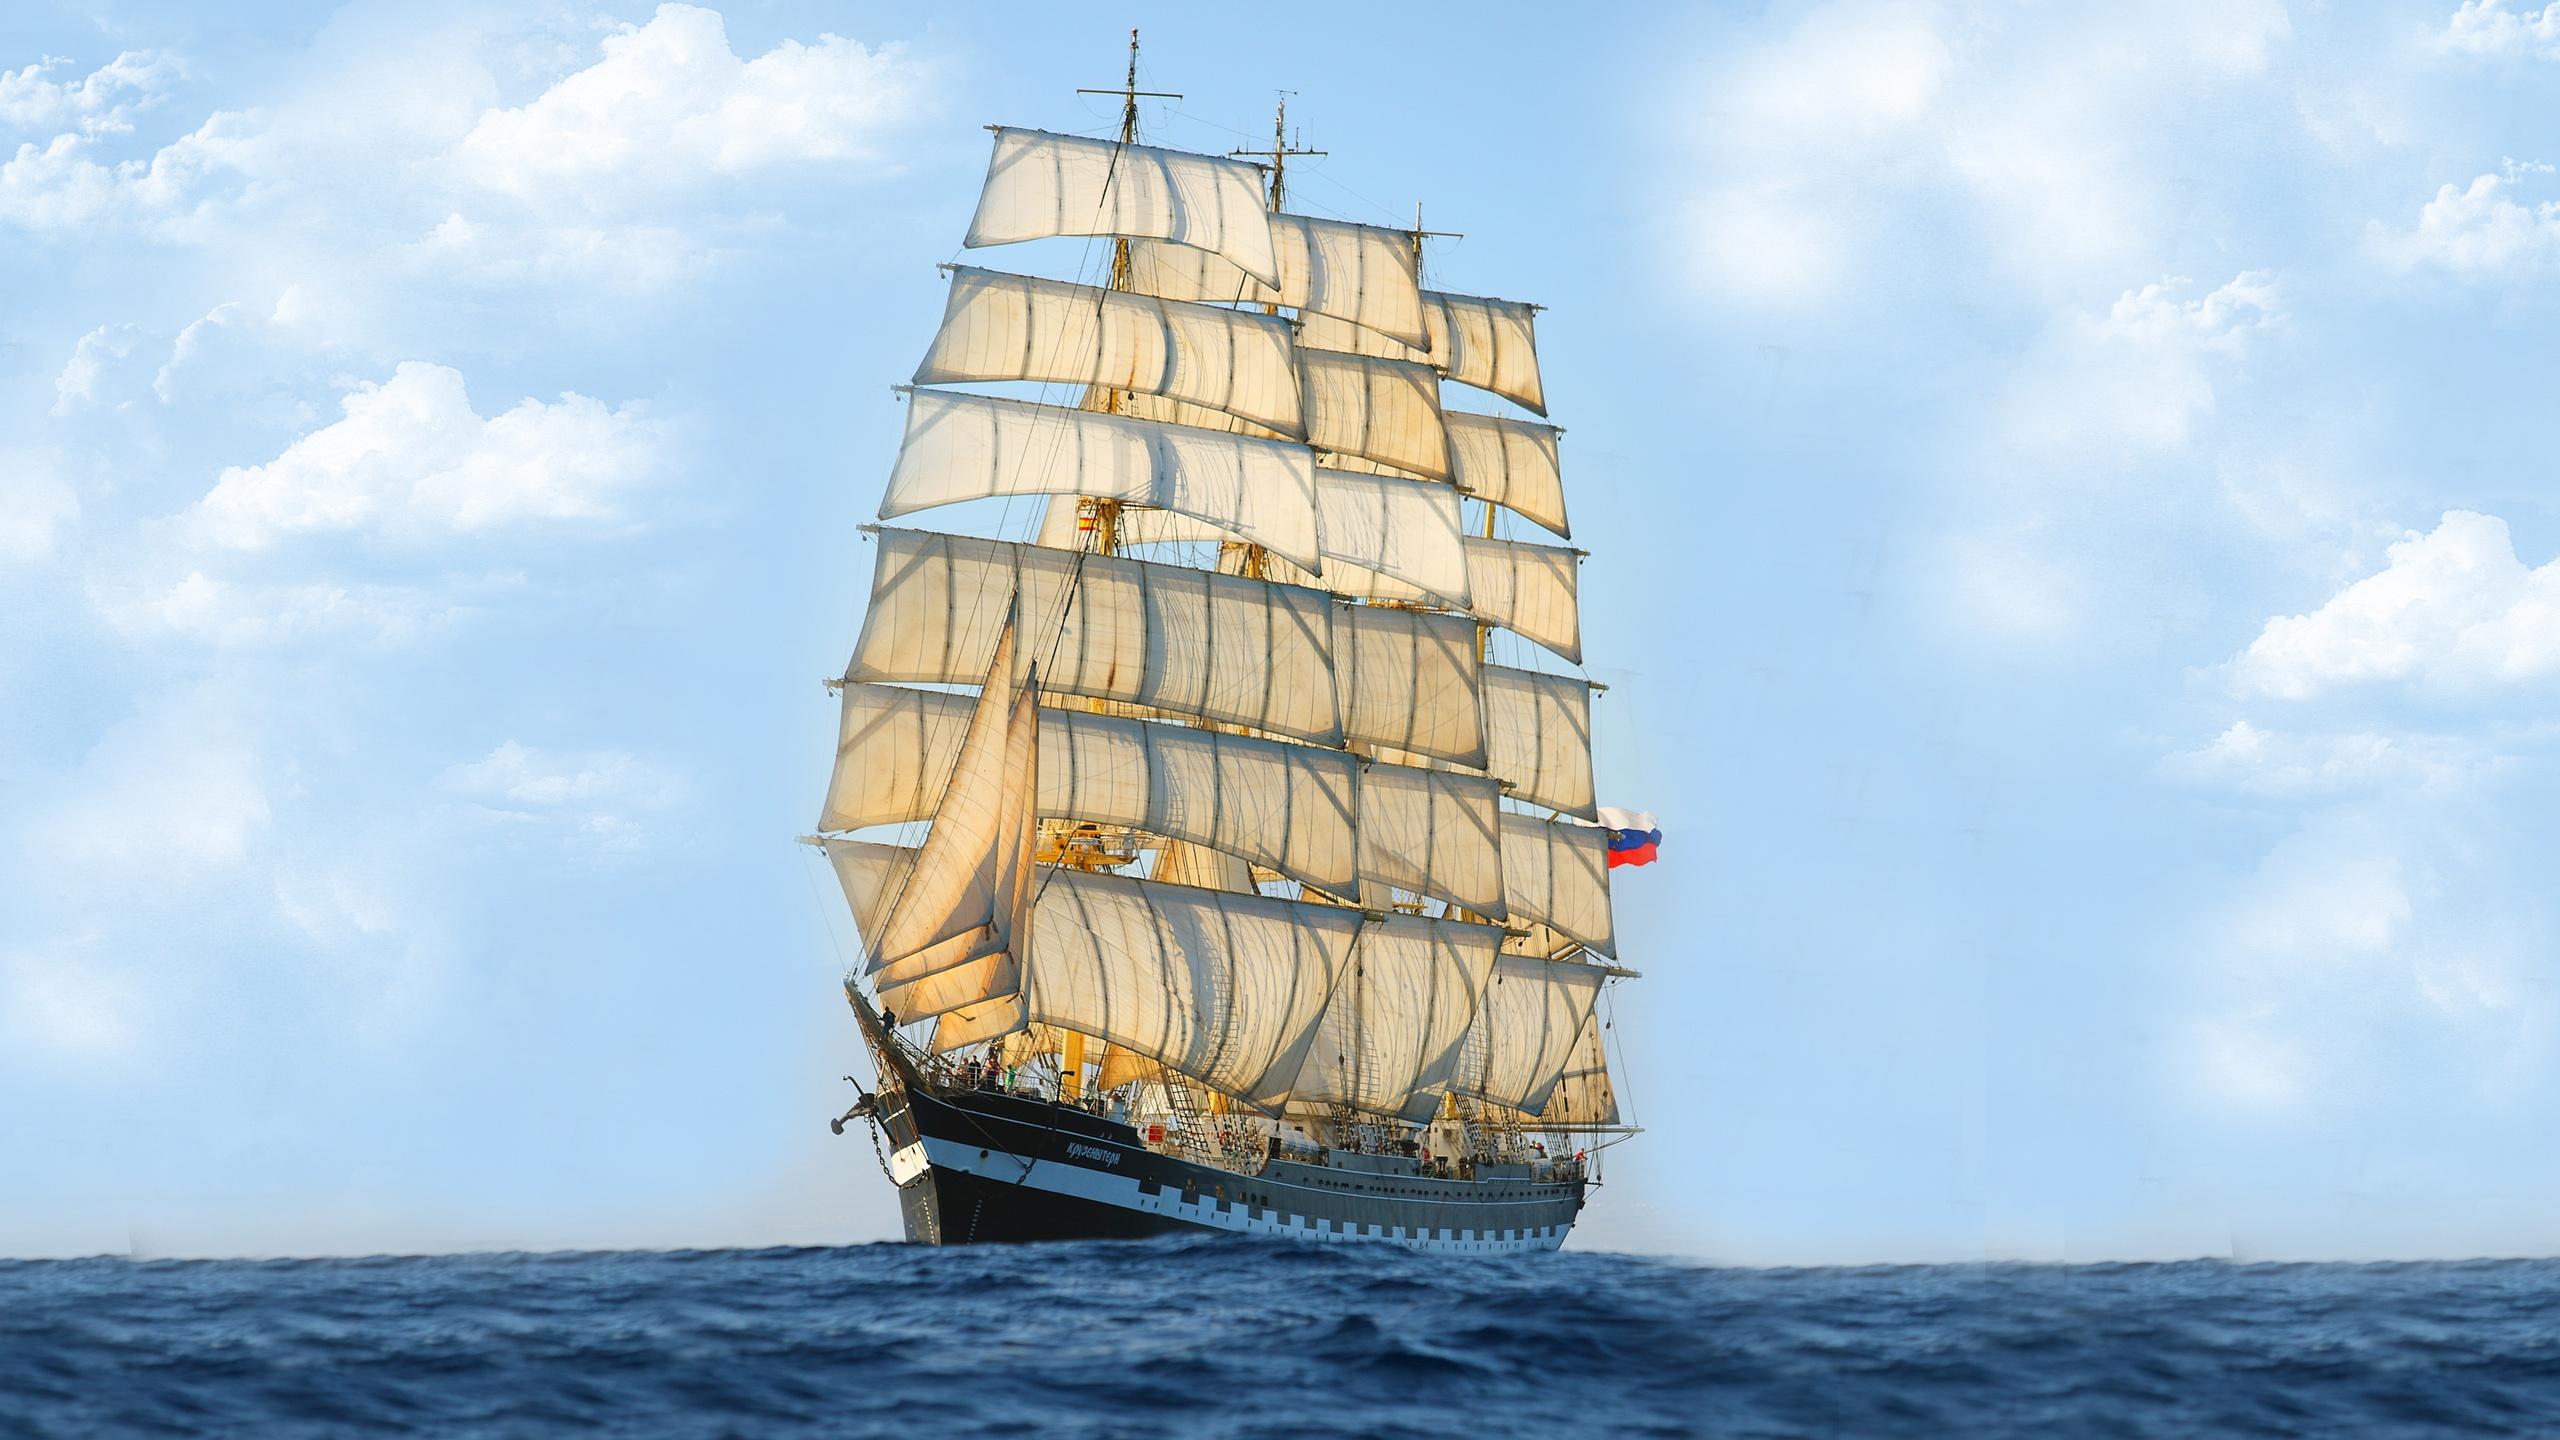 Segelschiffe auf dem meer  Segelschiff, Meer, blauer Himmel Hintergrundbilder | Andere ...